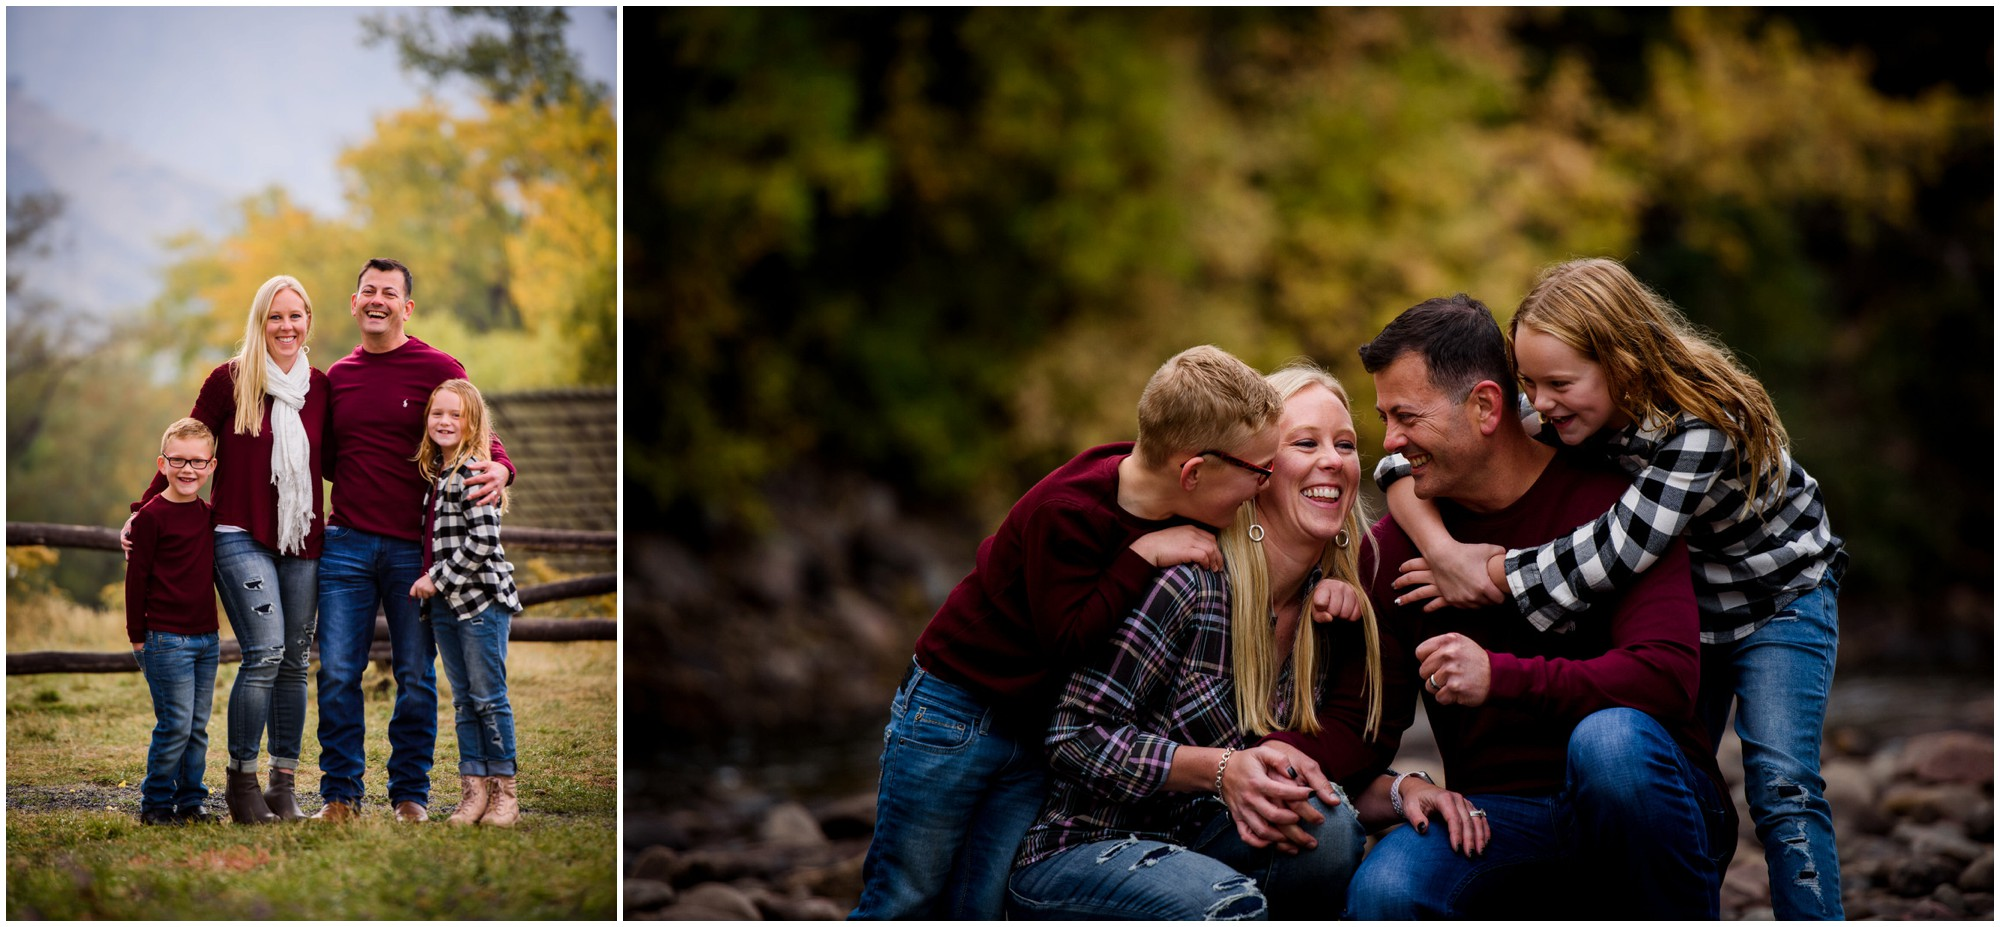 7-Golden-clear-creek-history-park-family-photography.jpg